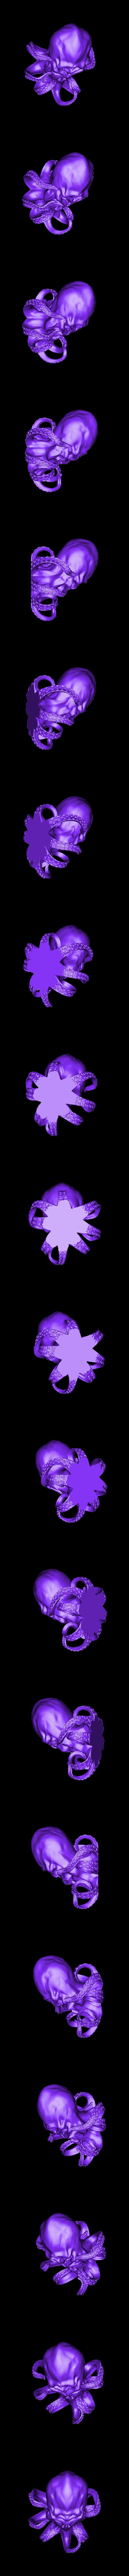 support free  solid Cthulhu skull.stl Download free STL file Cthulhu Skull • 3D printable design, LittleTup